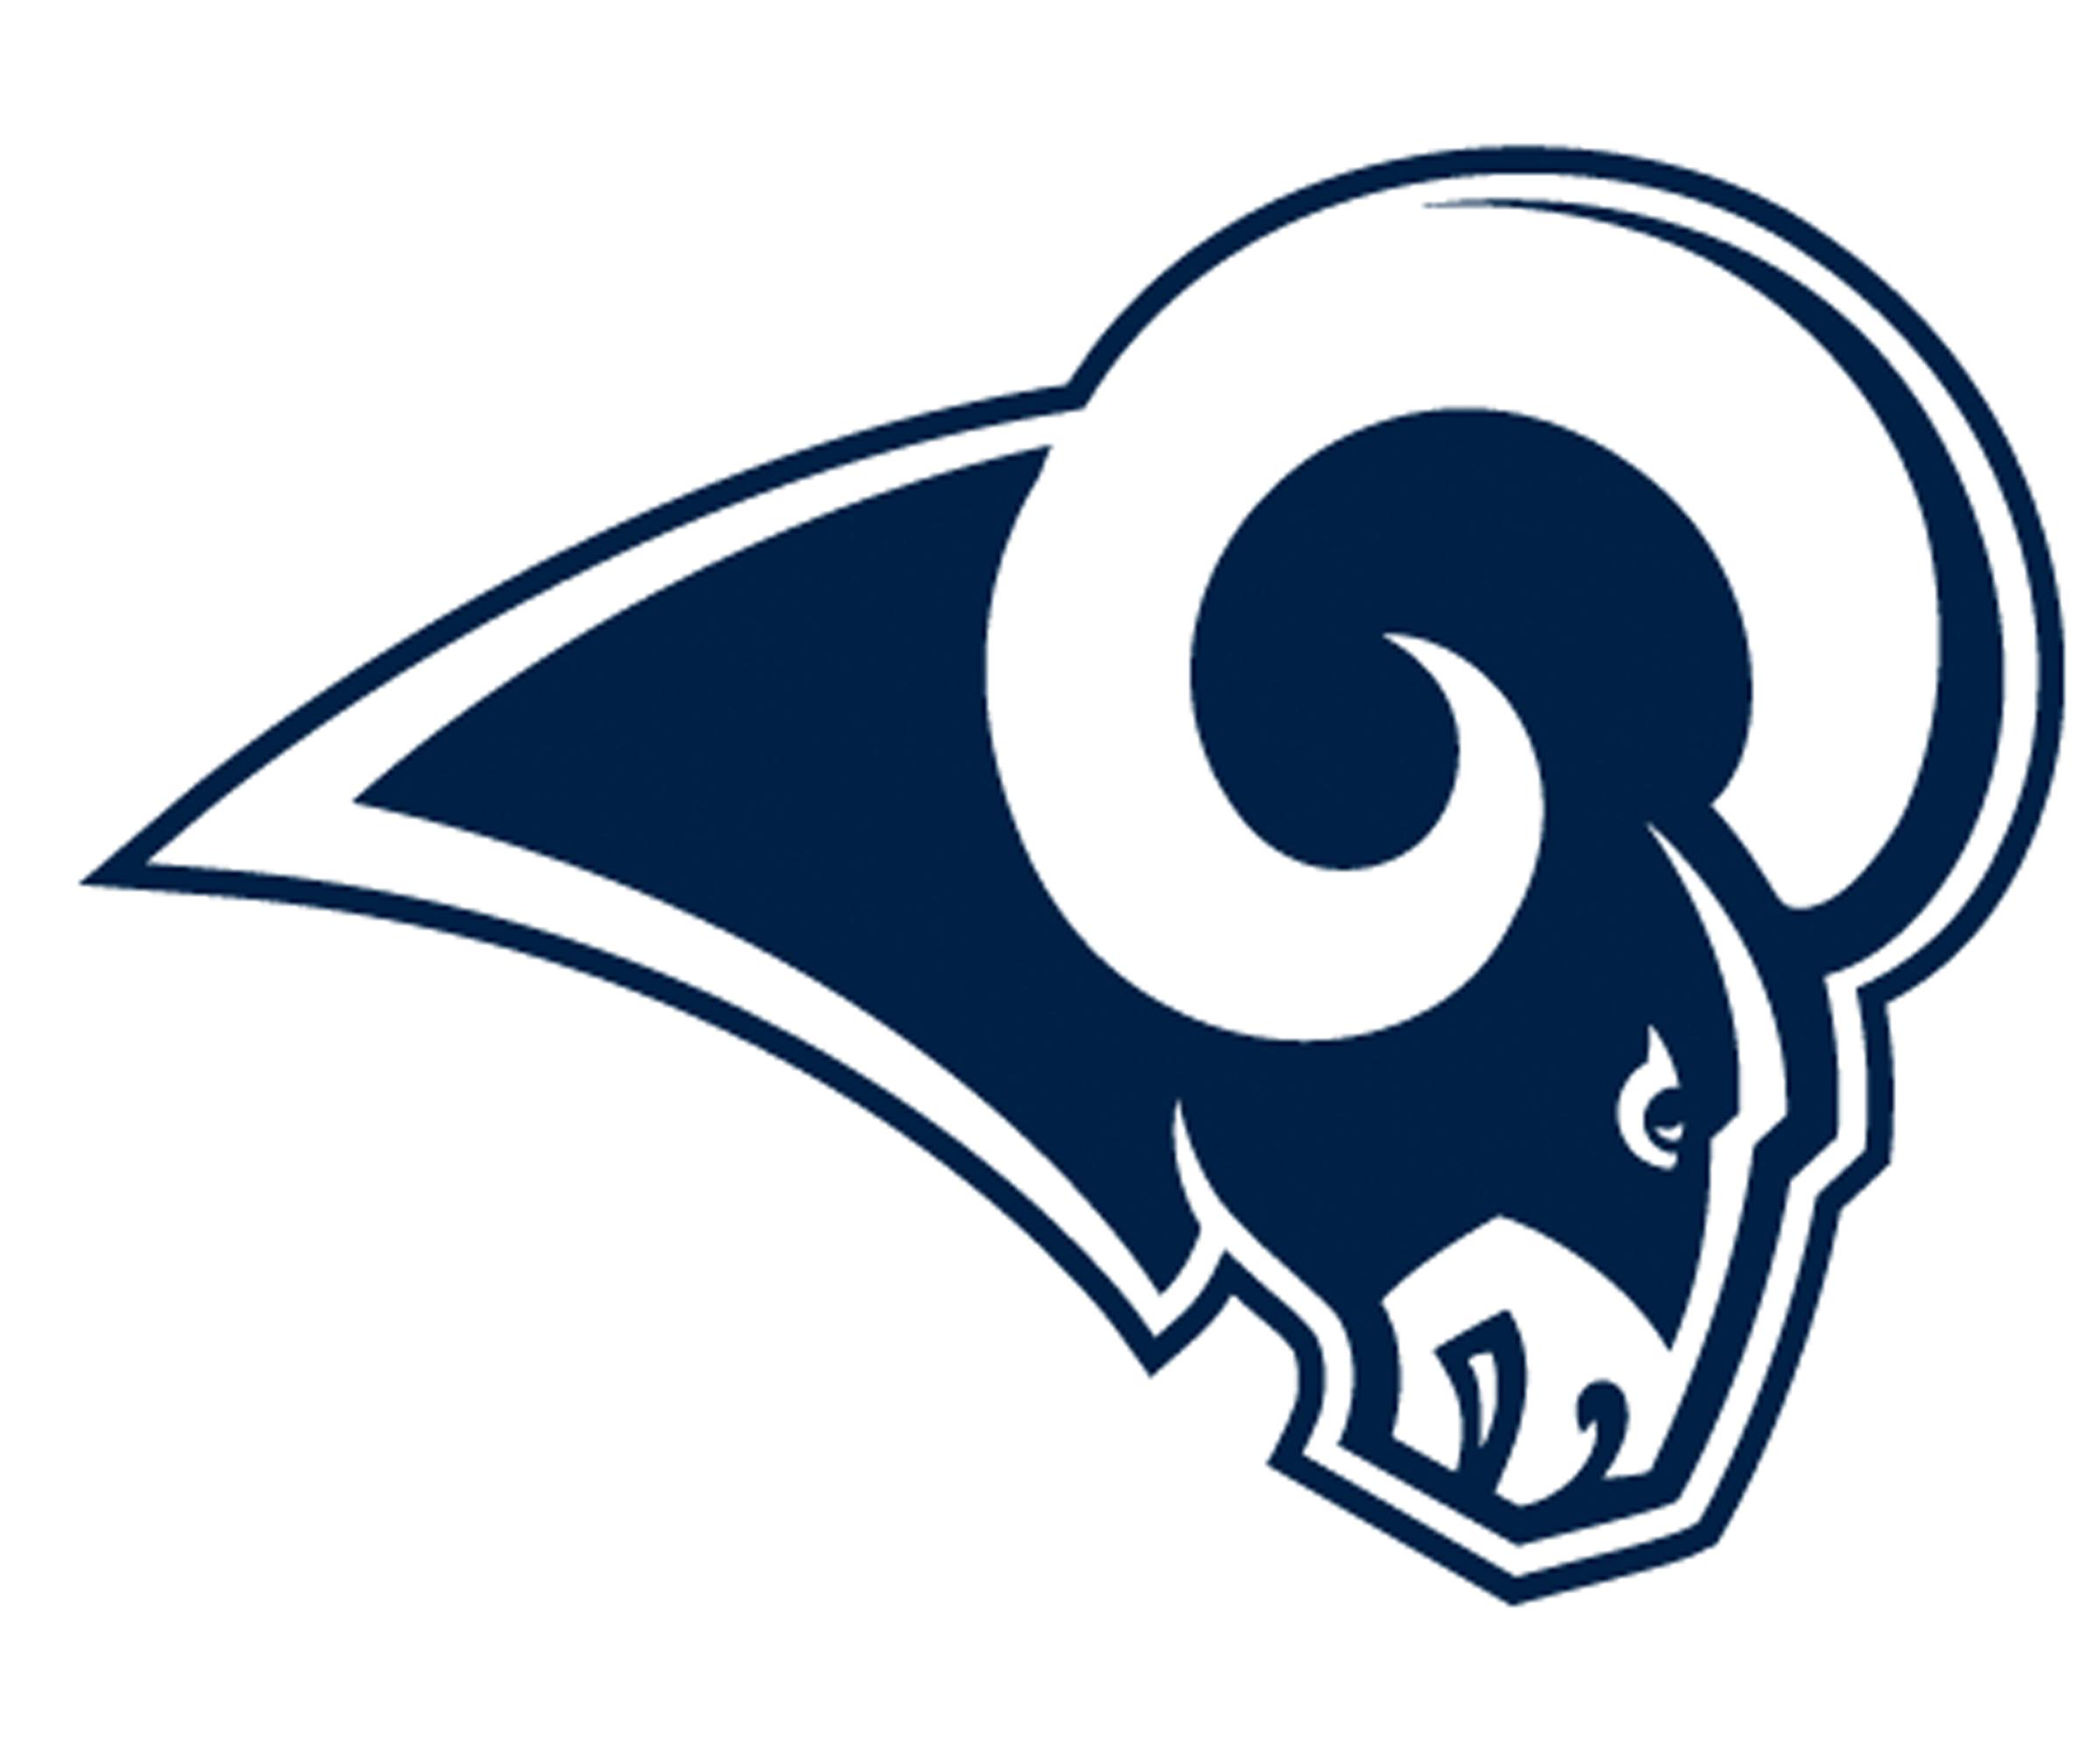 Los Angeles Rams - 77.29% growth rate - instagram(vs. 22.27% GrOWTH VIS league average)